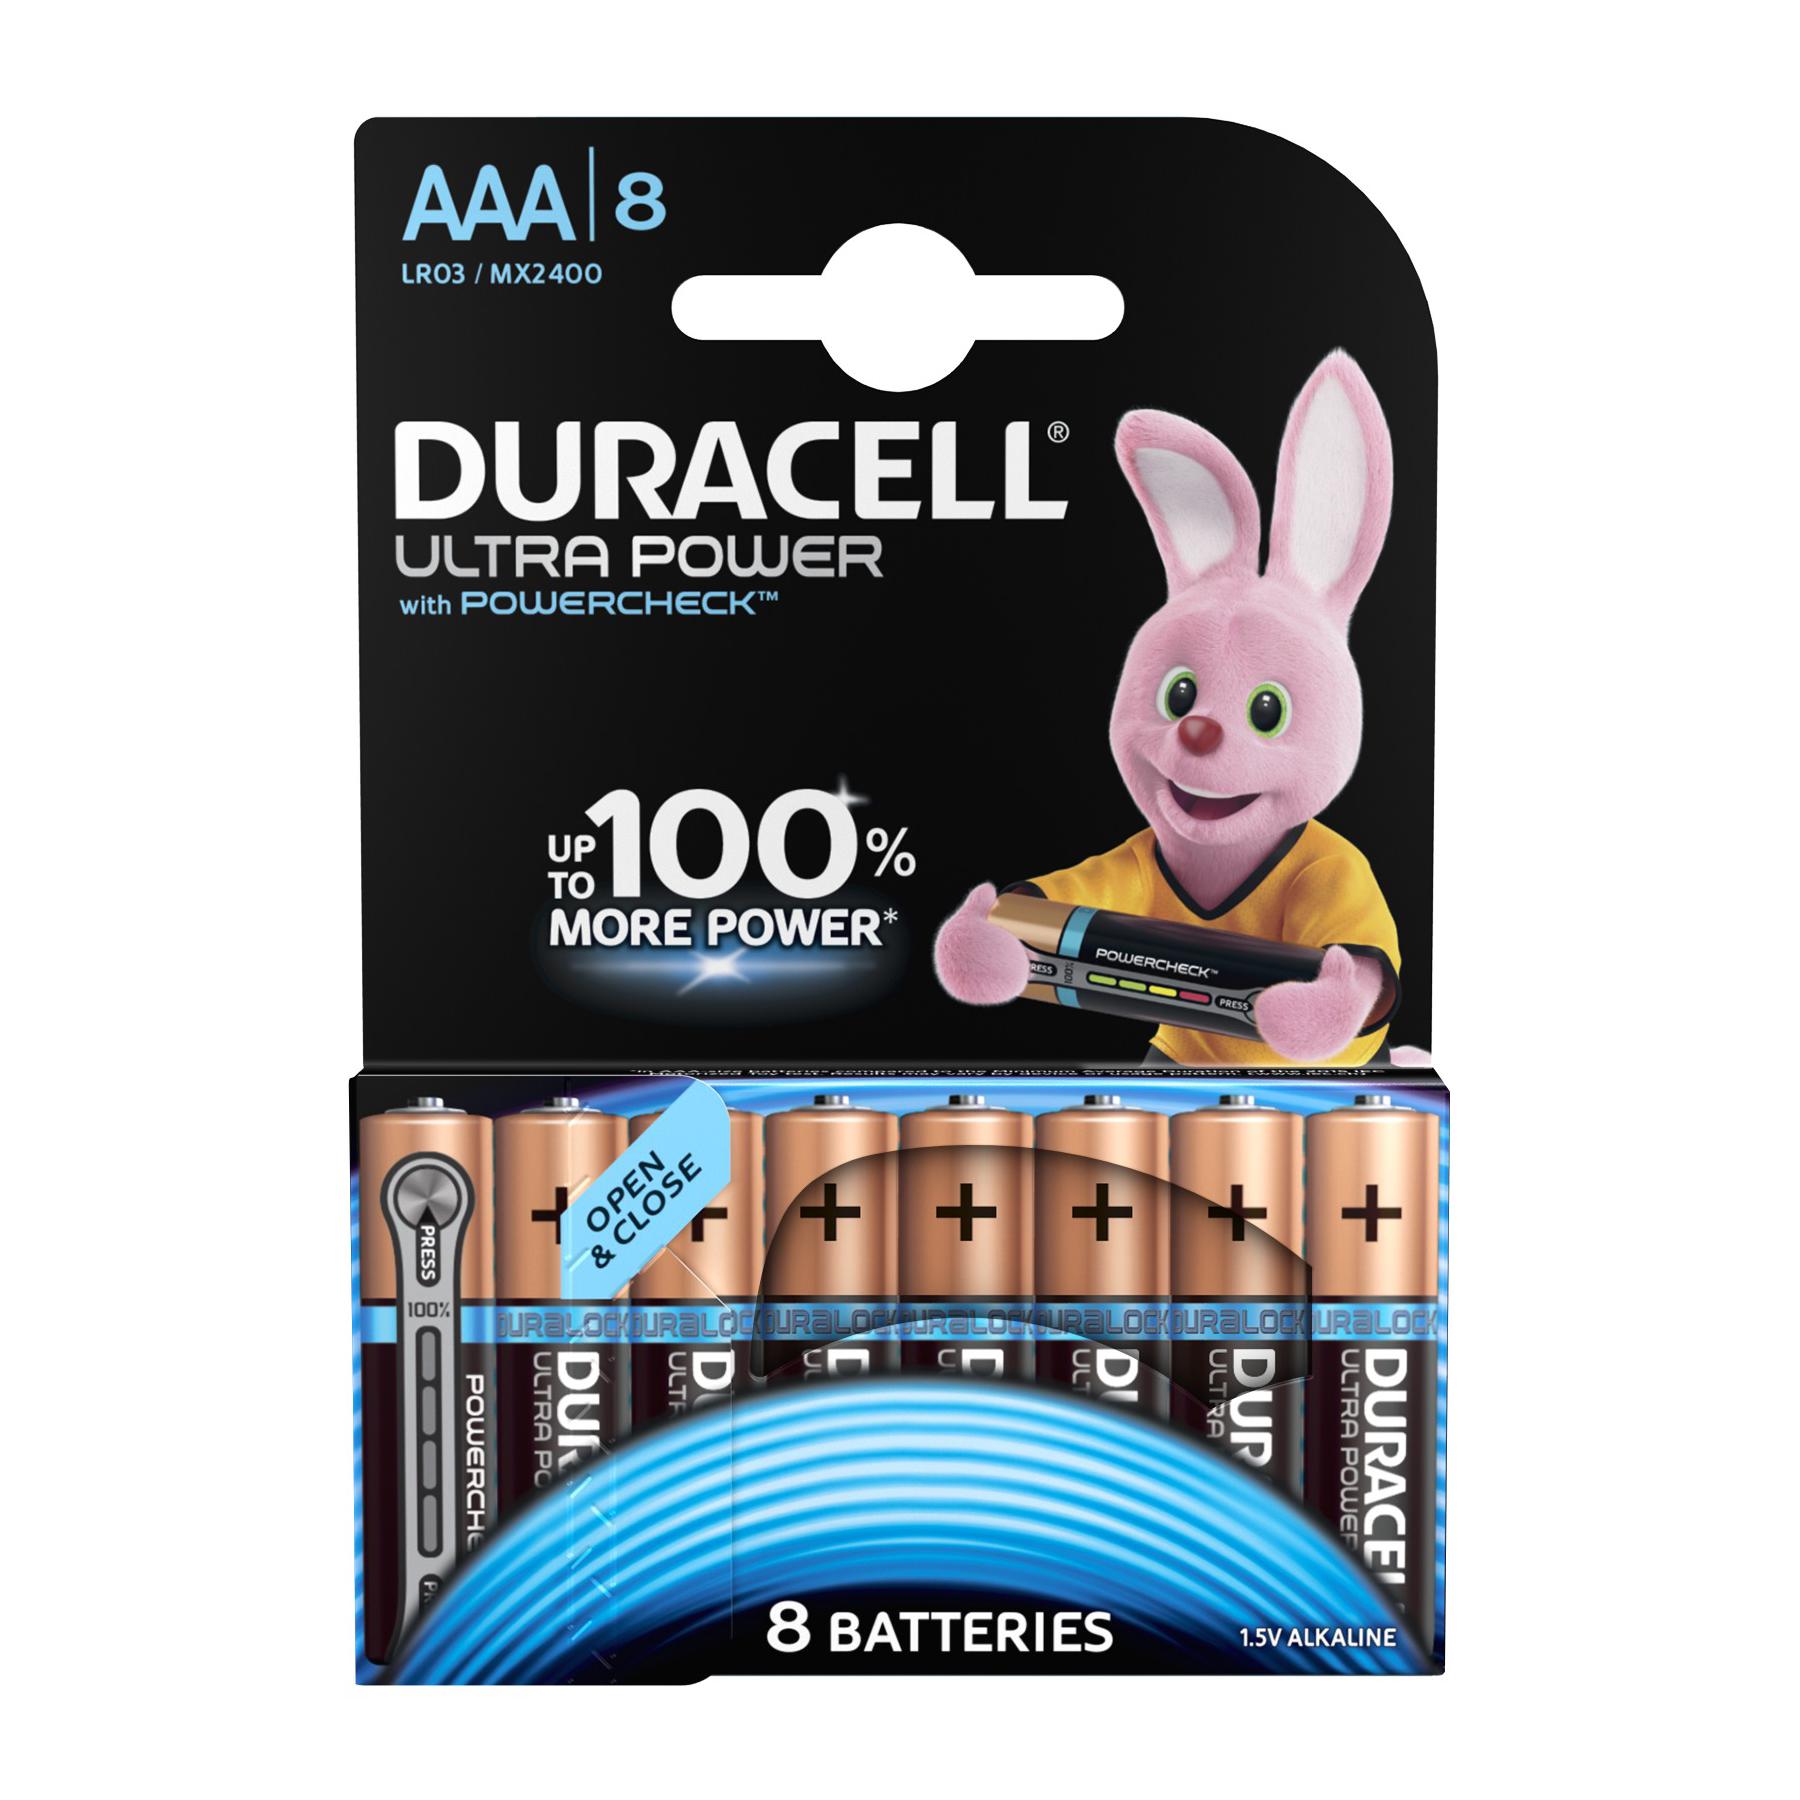 Duracell Ultra Power MX2400 Battery Alkaline 1.5V AAA Ref 81235515 [Pack 8] [2 for 1] Dec 2019